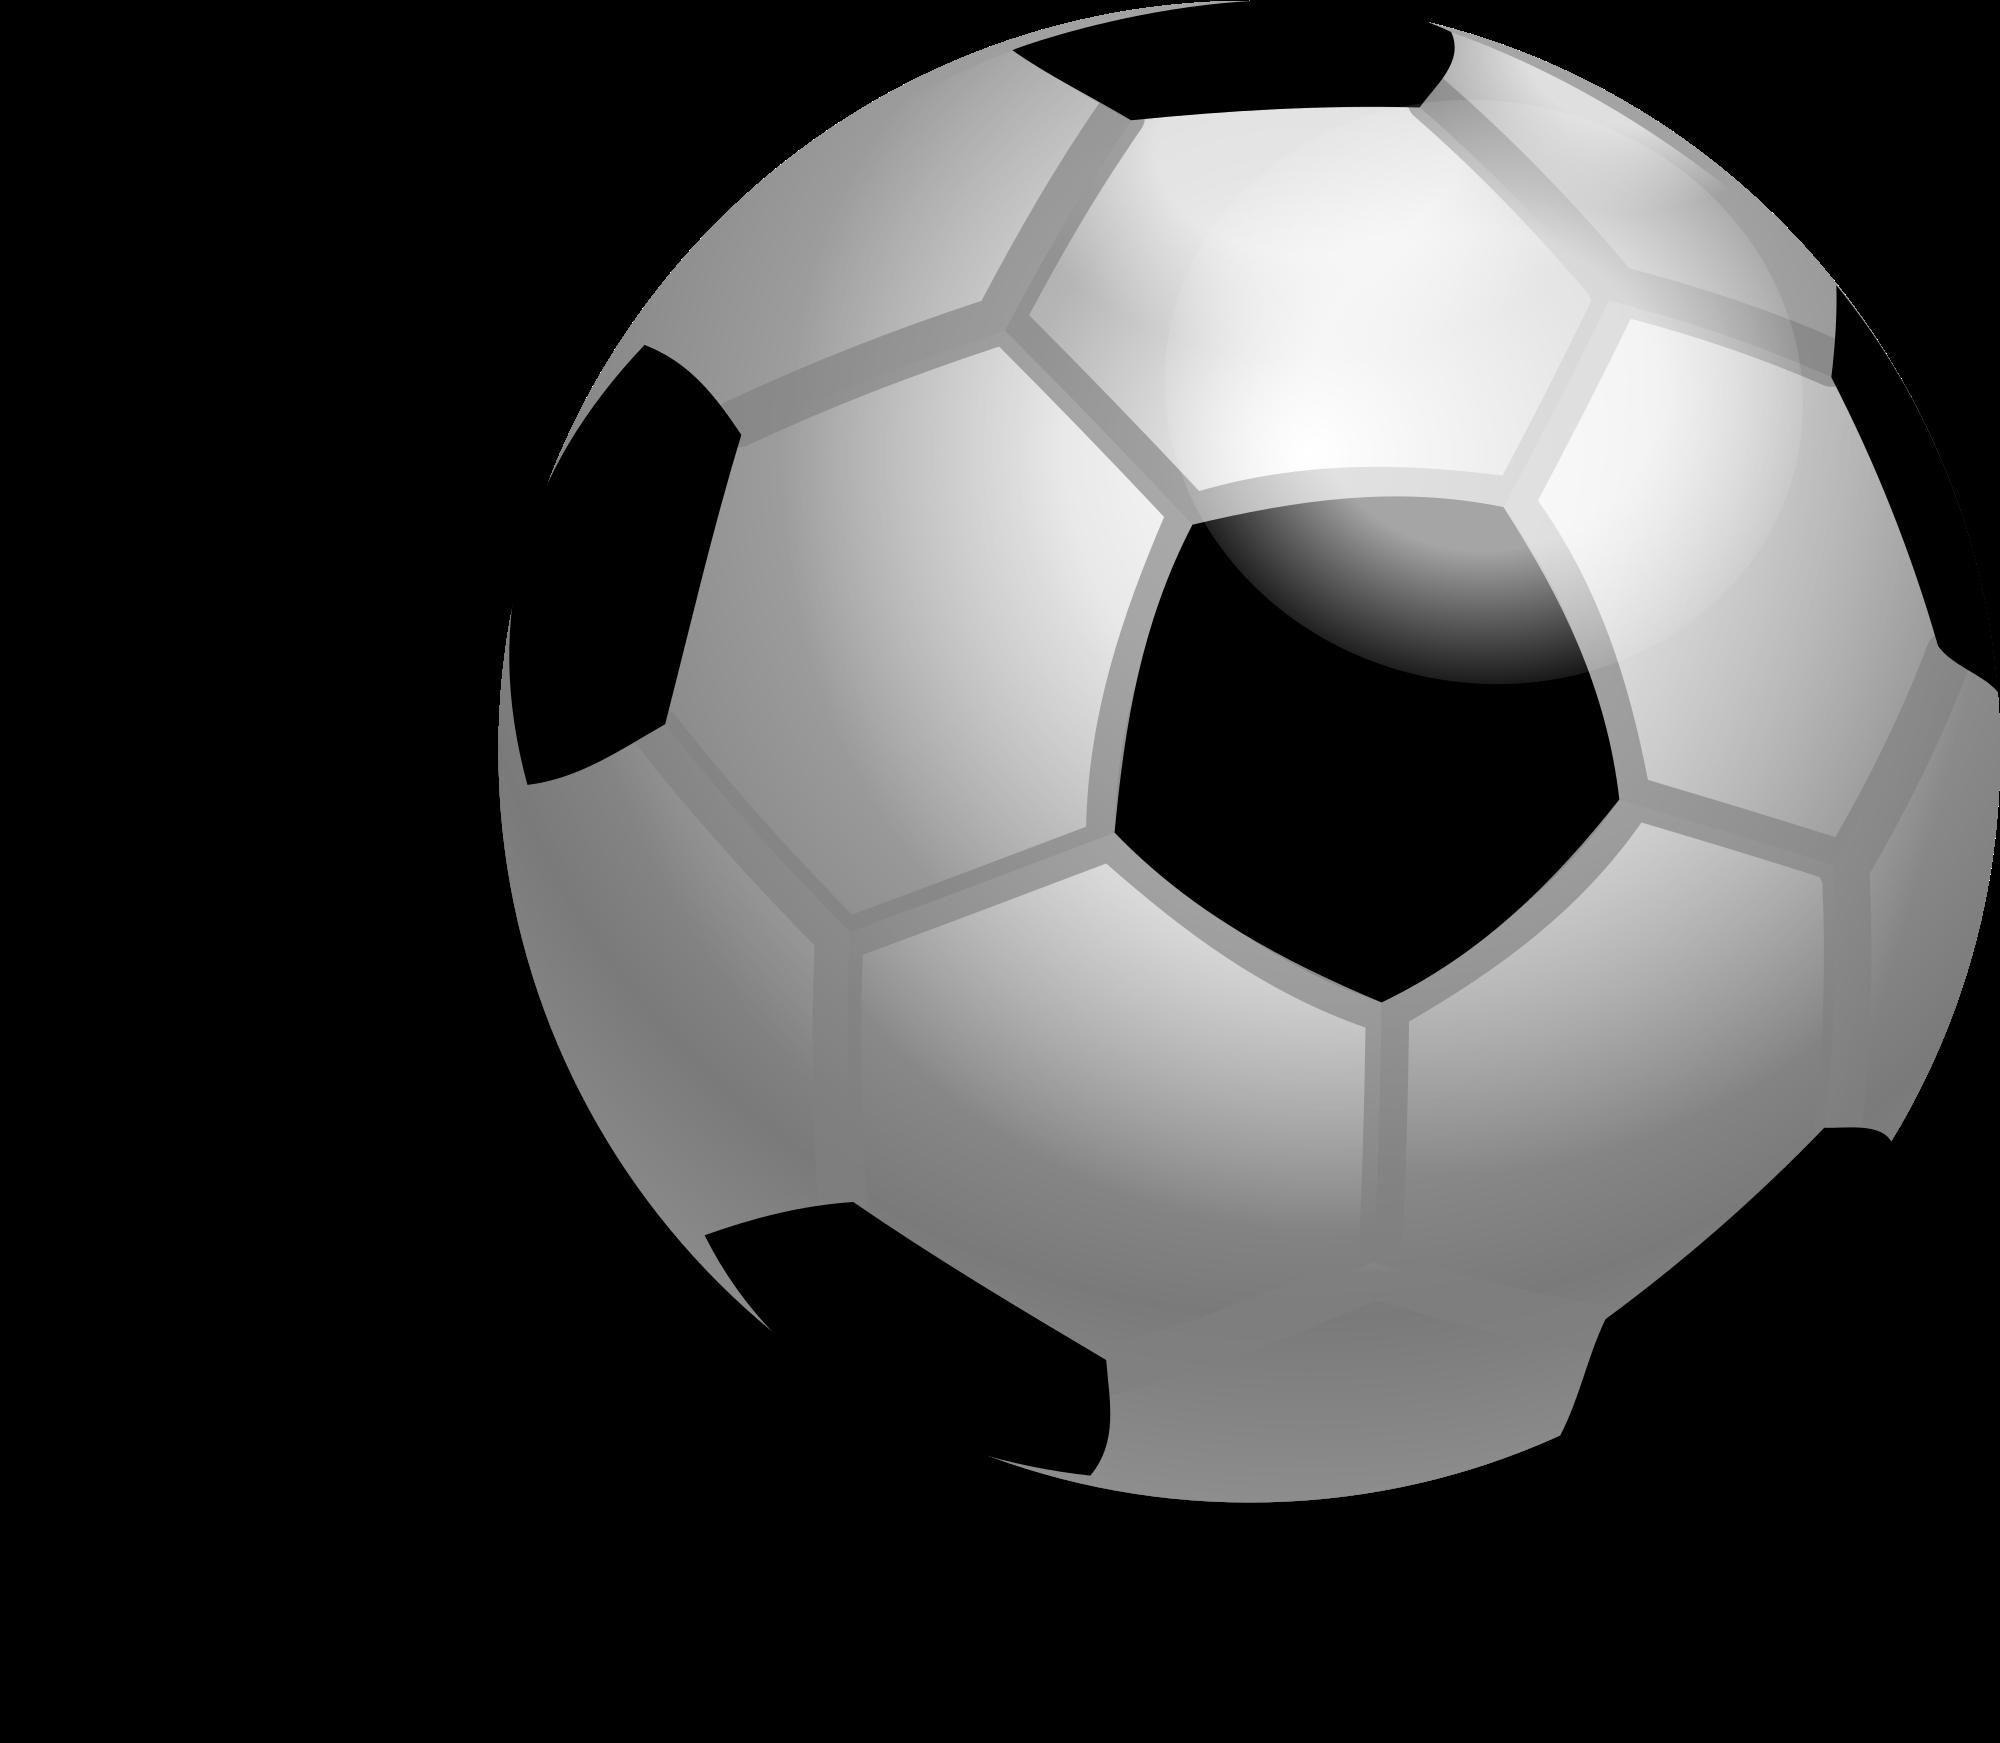 Soccer ball clip art images clipart